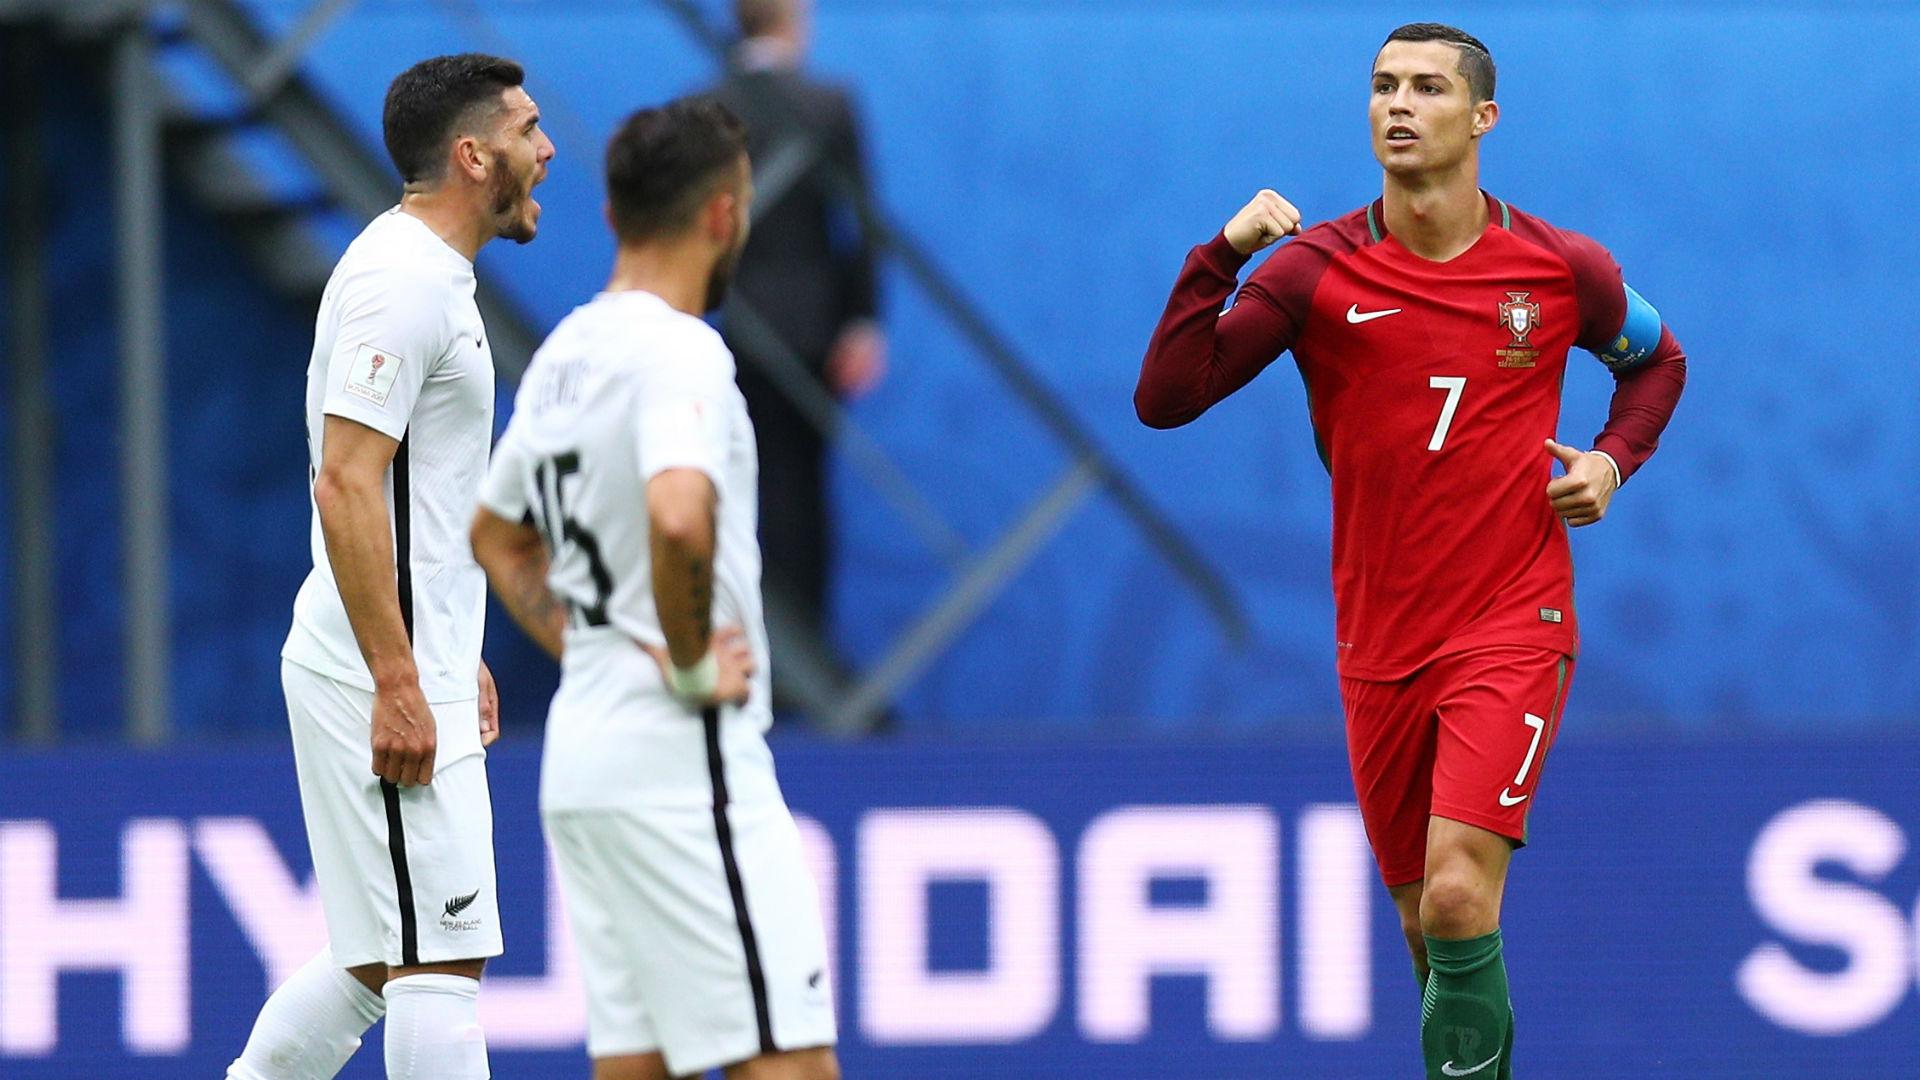 Juan Antonio Pizzi — Portugal será difícil